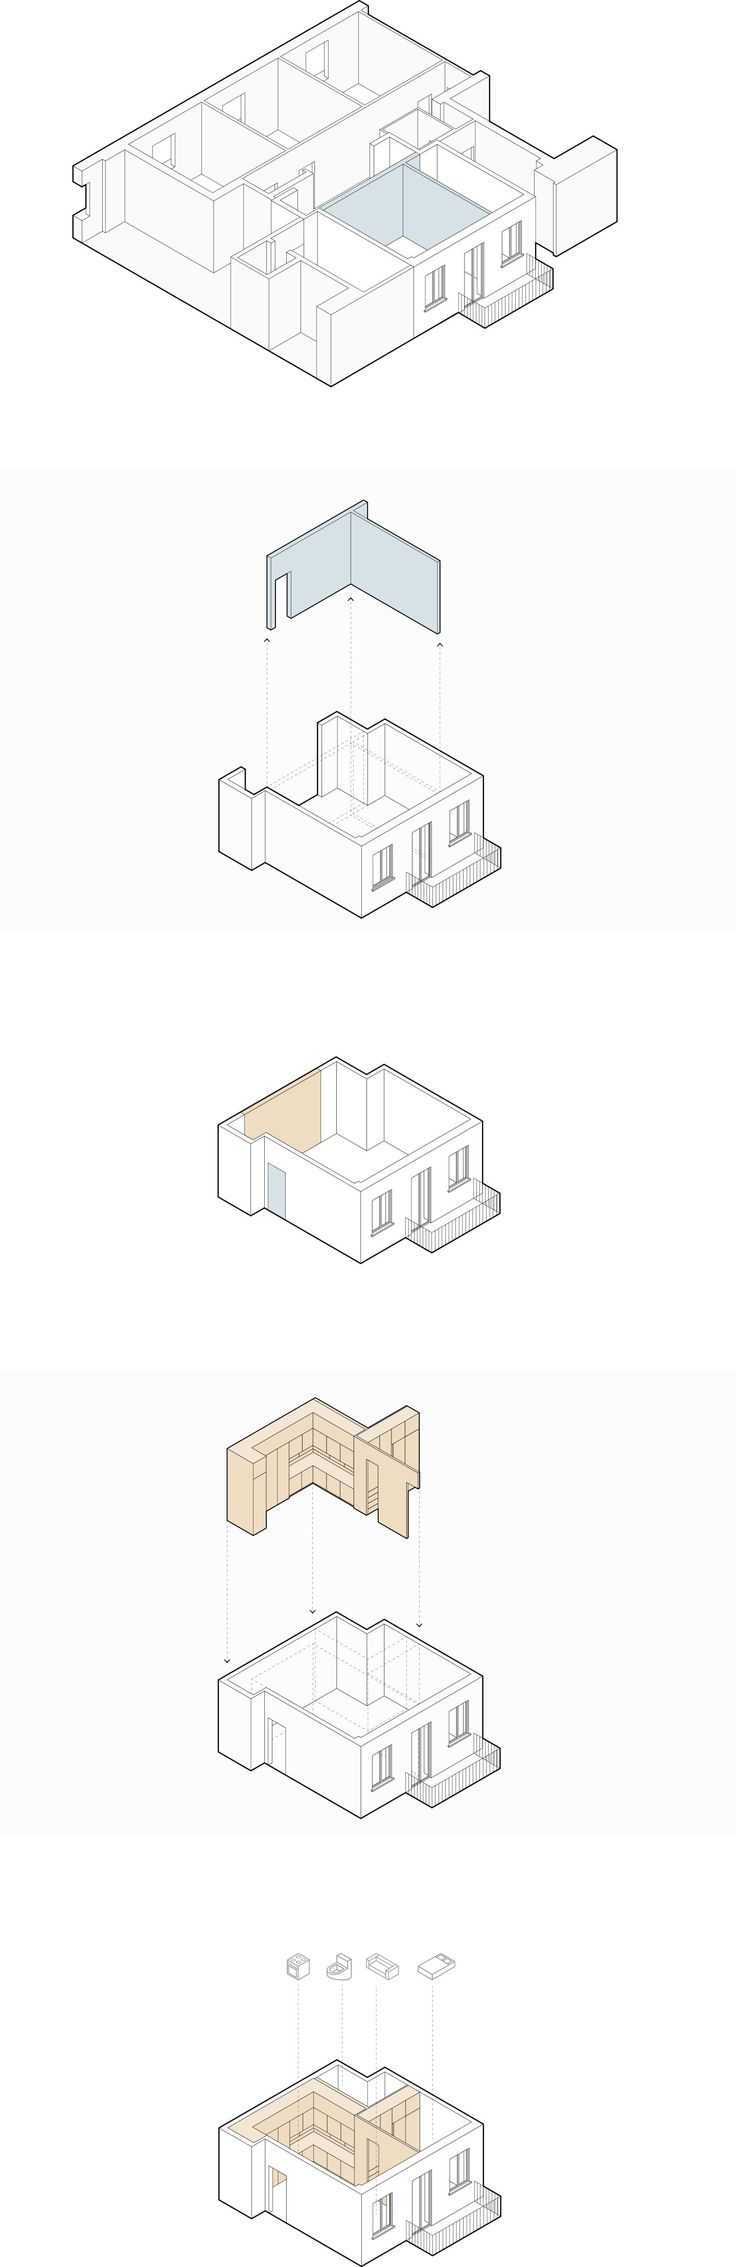 DIA_AXO_Terzi Beduschi architetti · 0108 · Architettura italiana